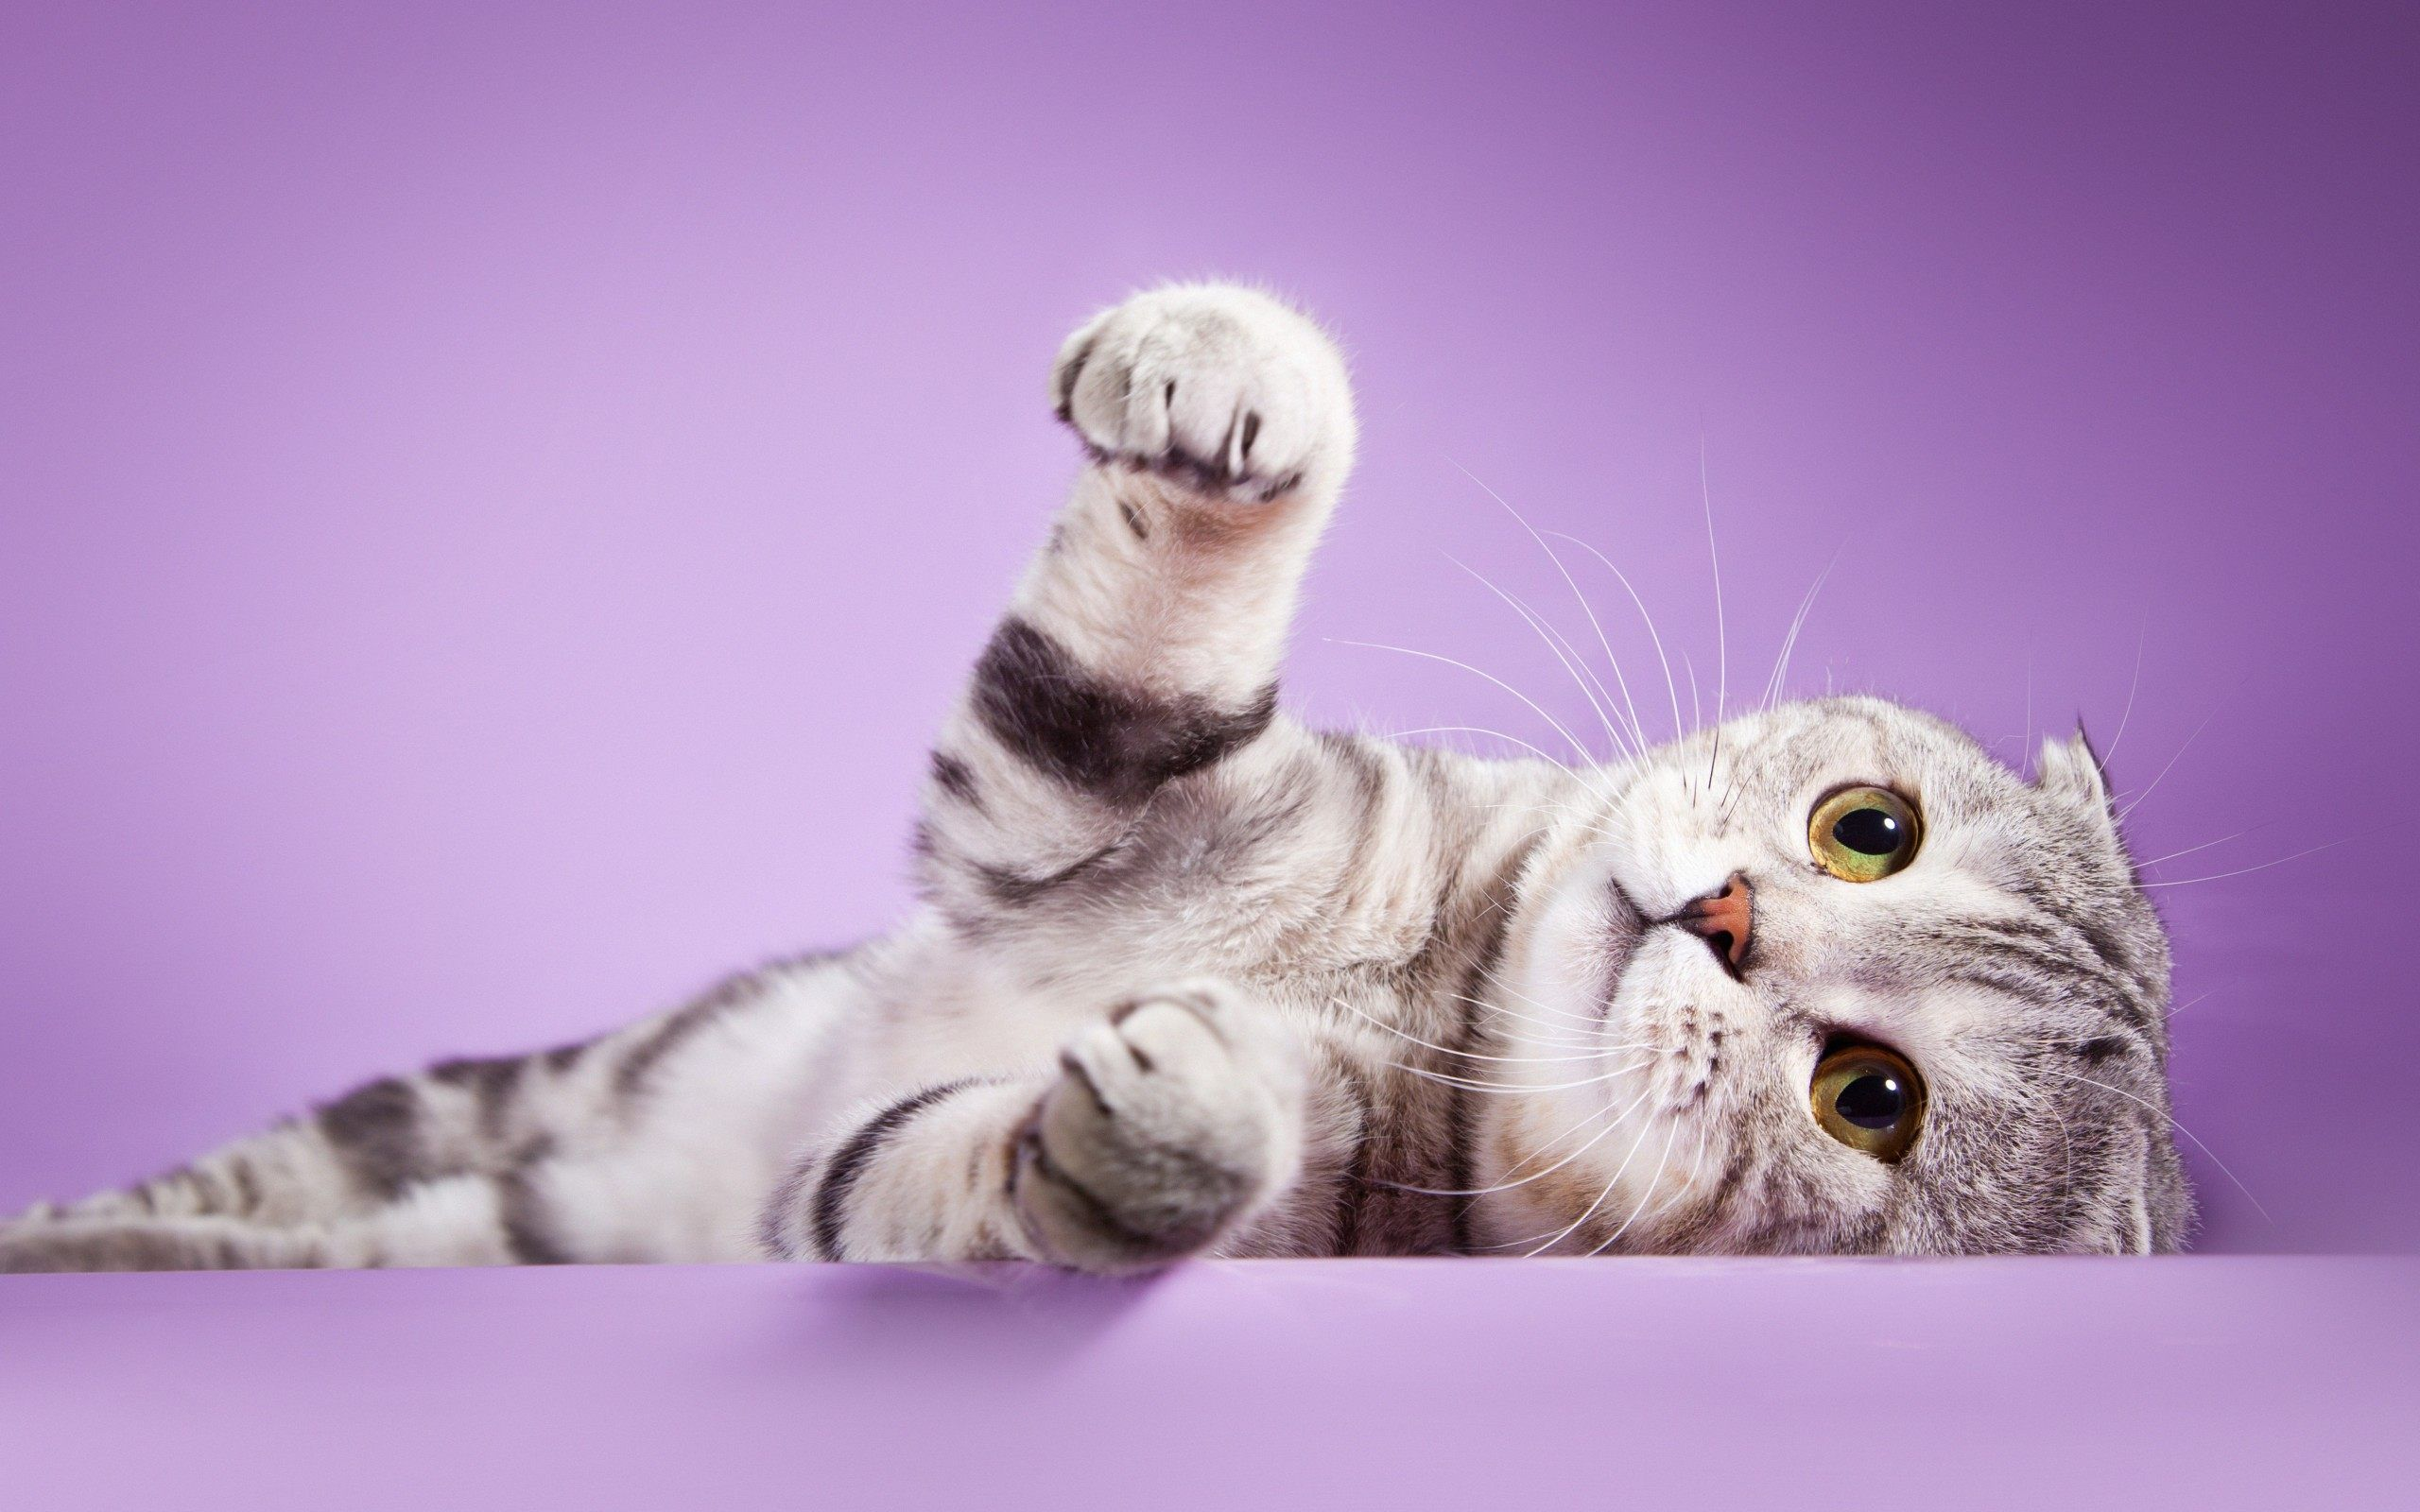 Scottish Fold Cat Wallpaper Gfxhive Cat Scottish Fold Scottish Fold Kittens Scottish Fold Cat Kittens